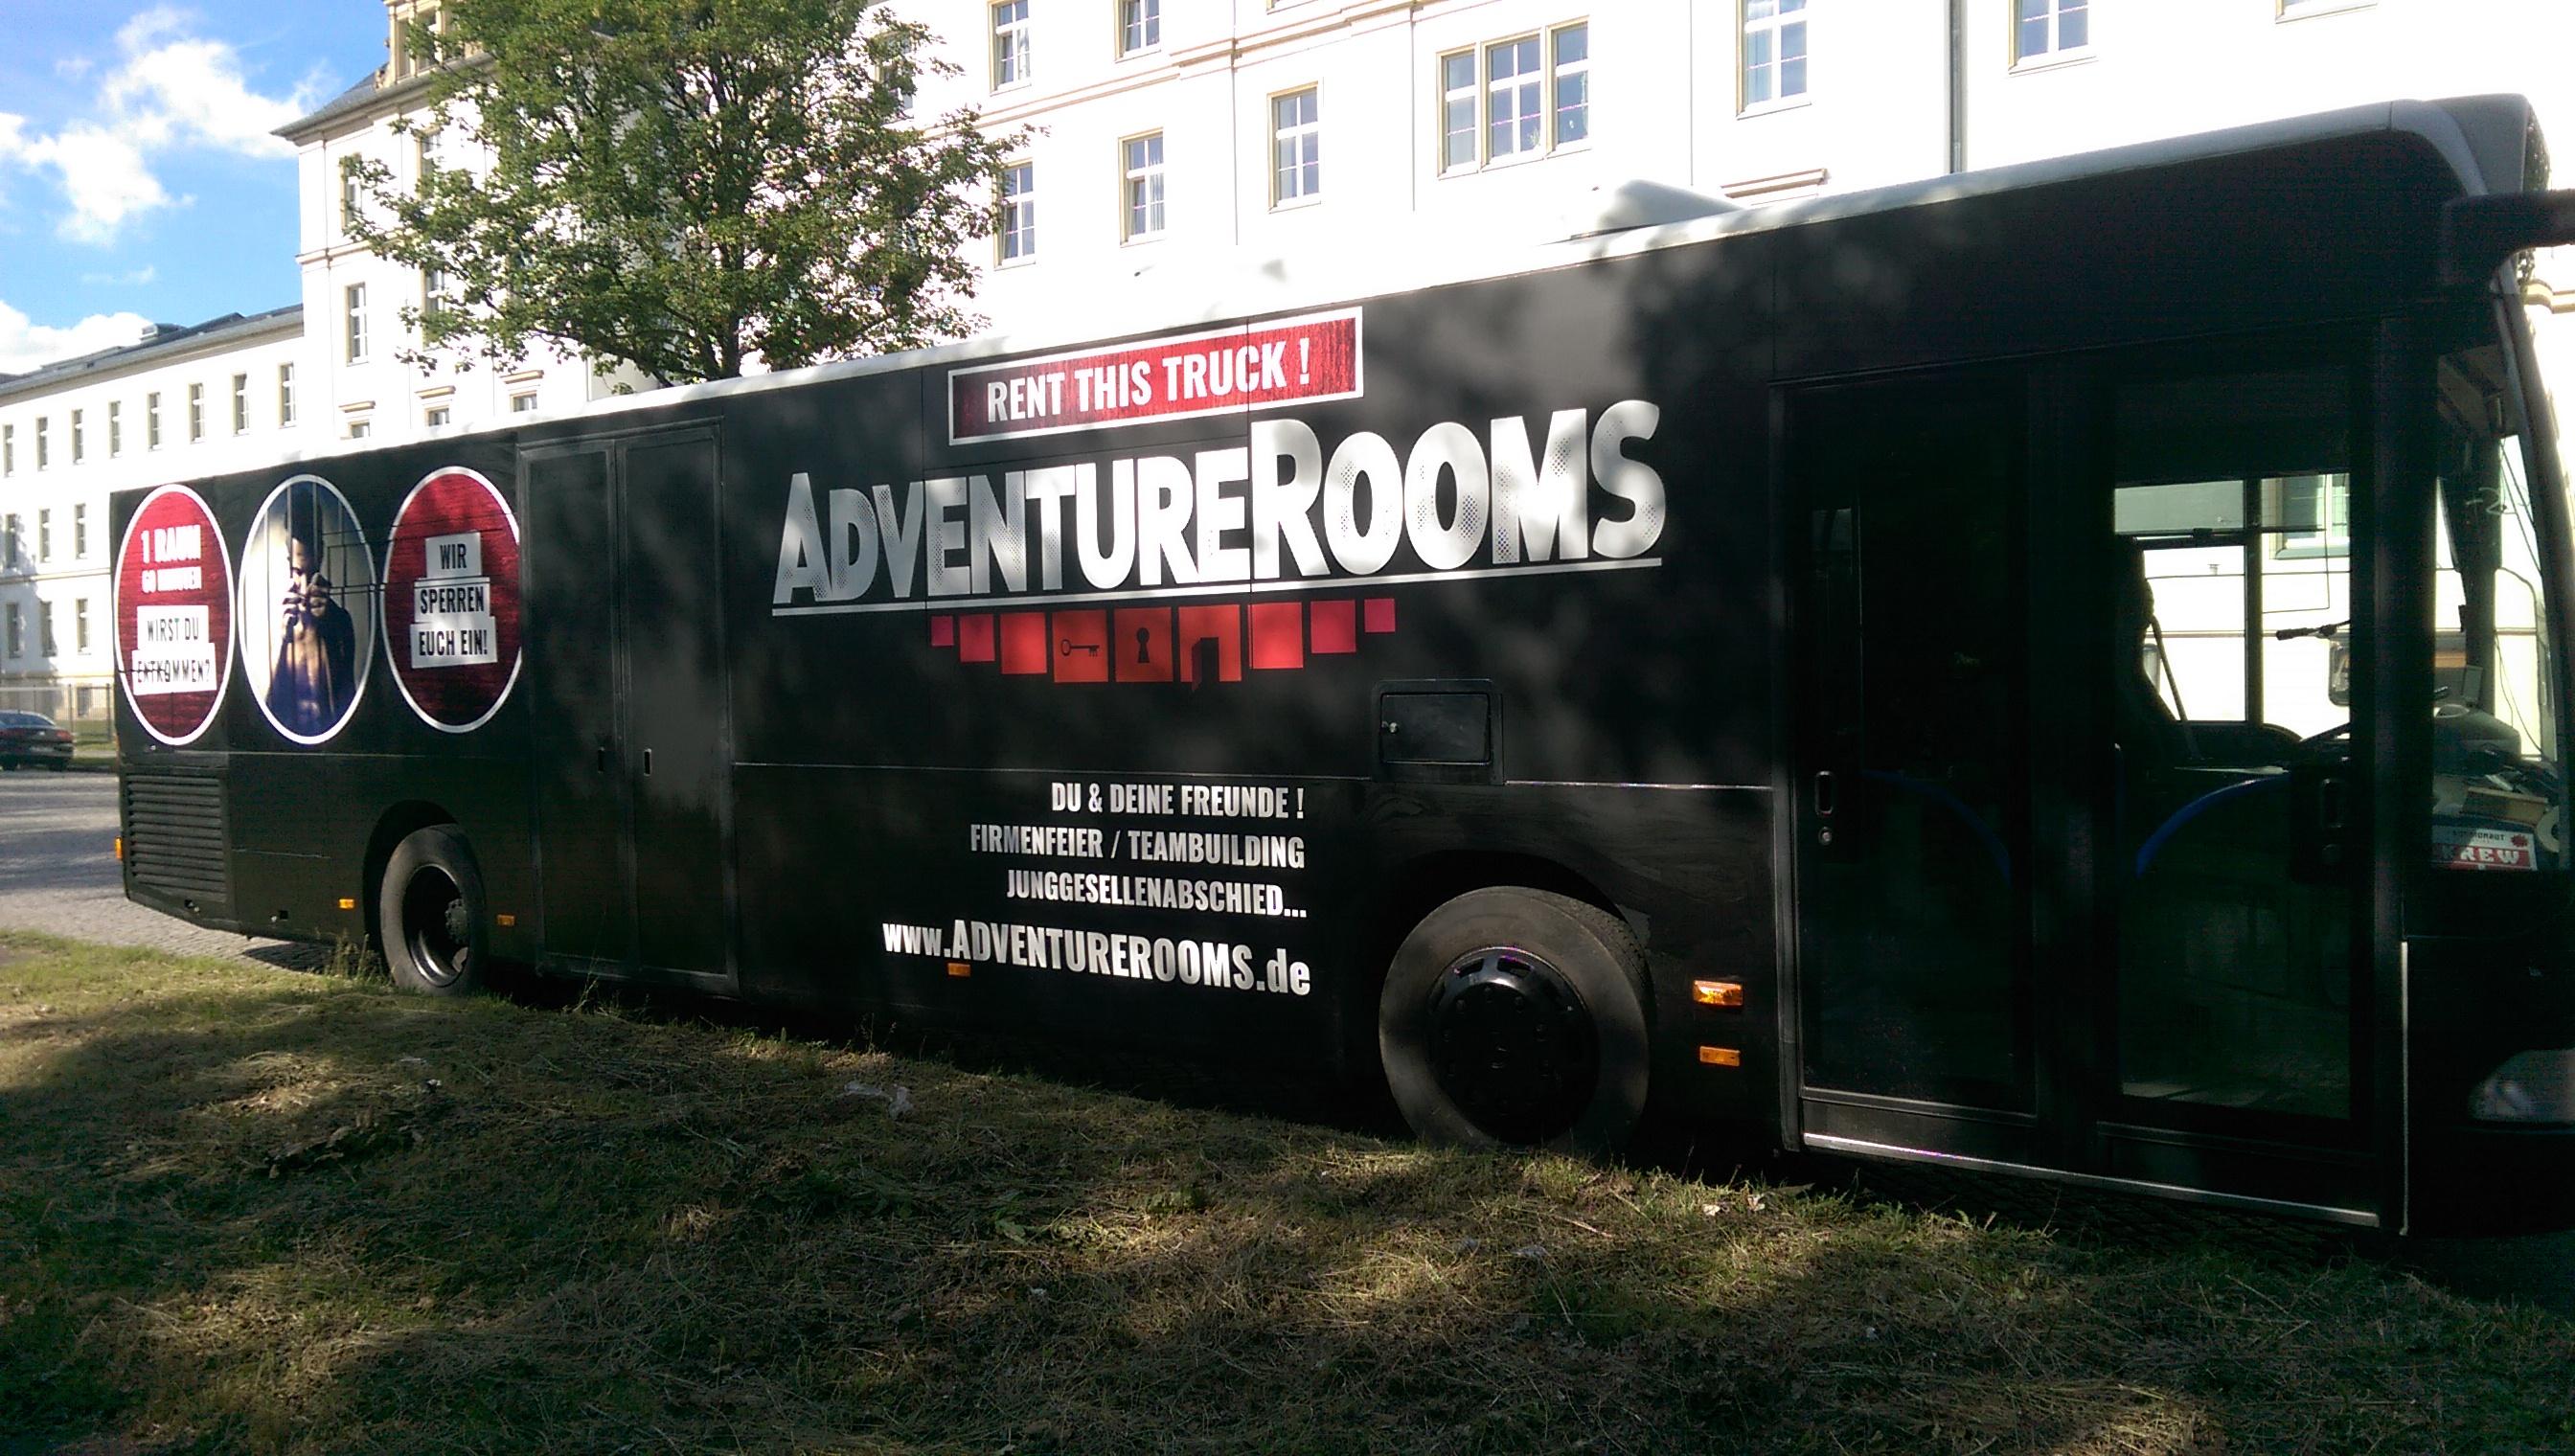 AdventureRooms on Tour mobiler Escape Game Bus